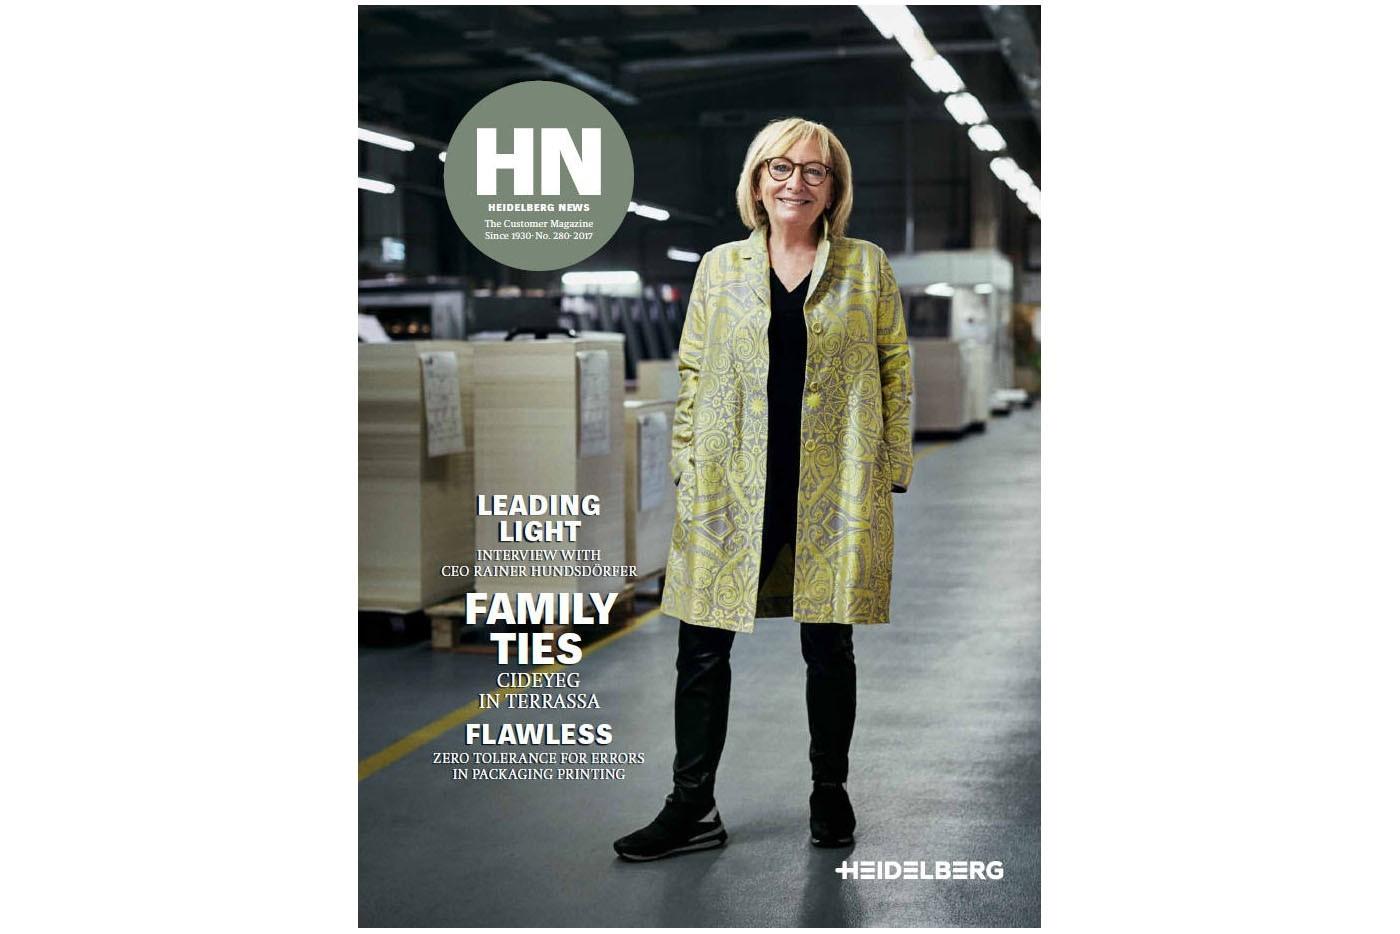 hn_280_cover